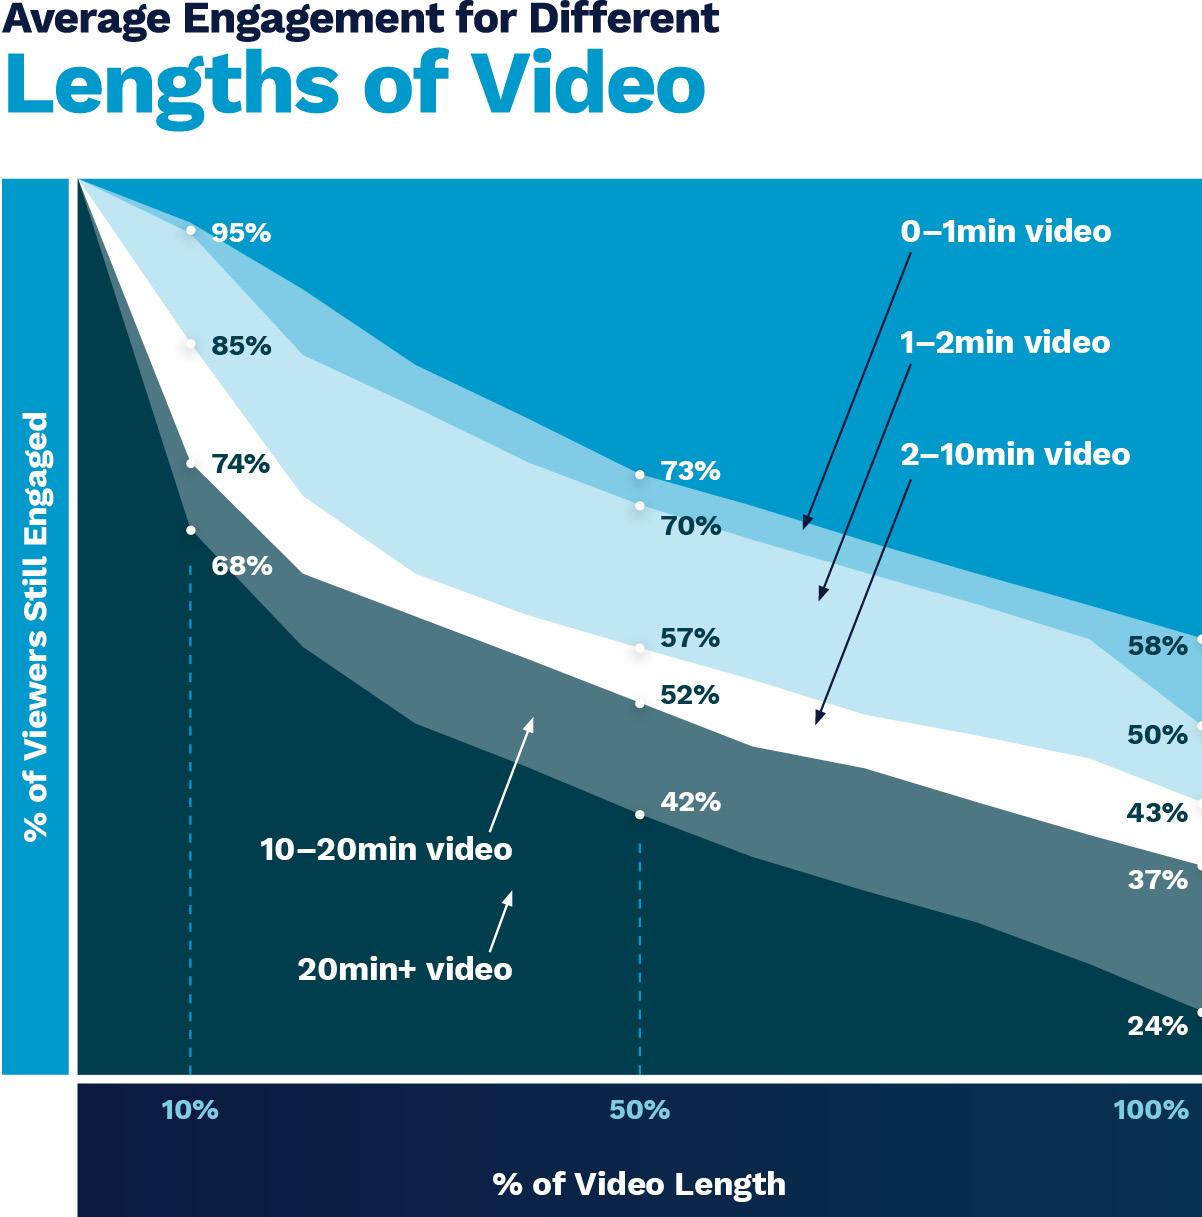 video-engagement-levels-chart